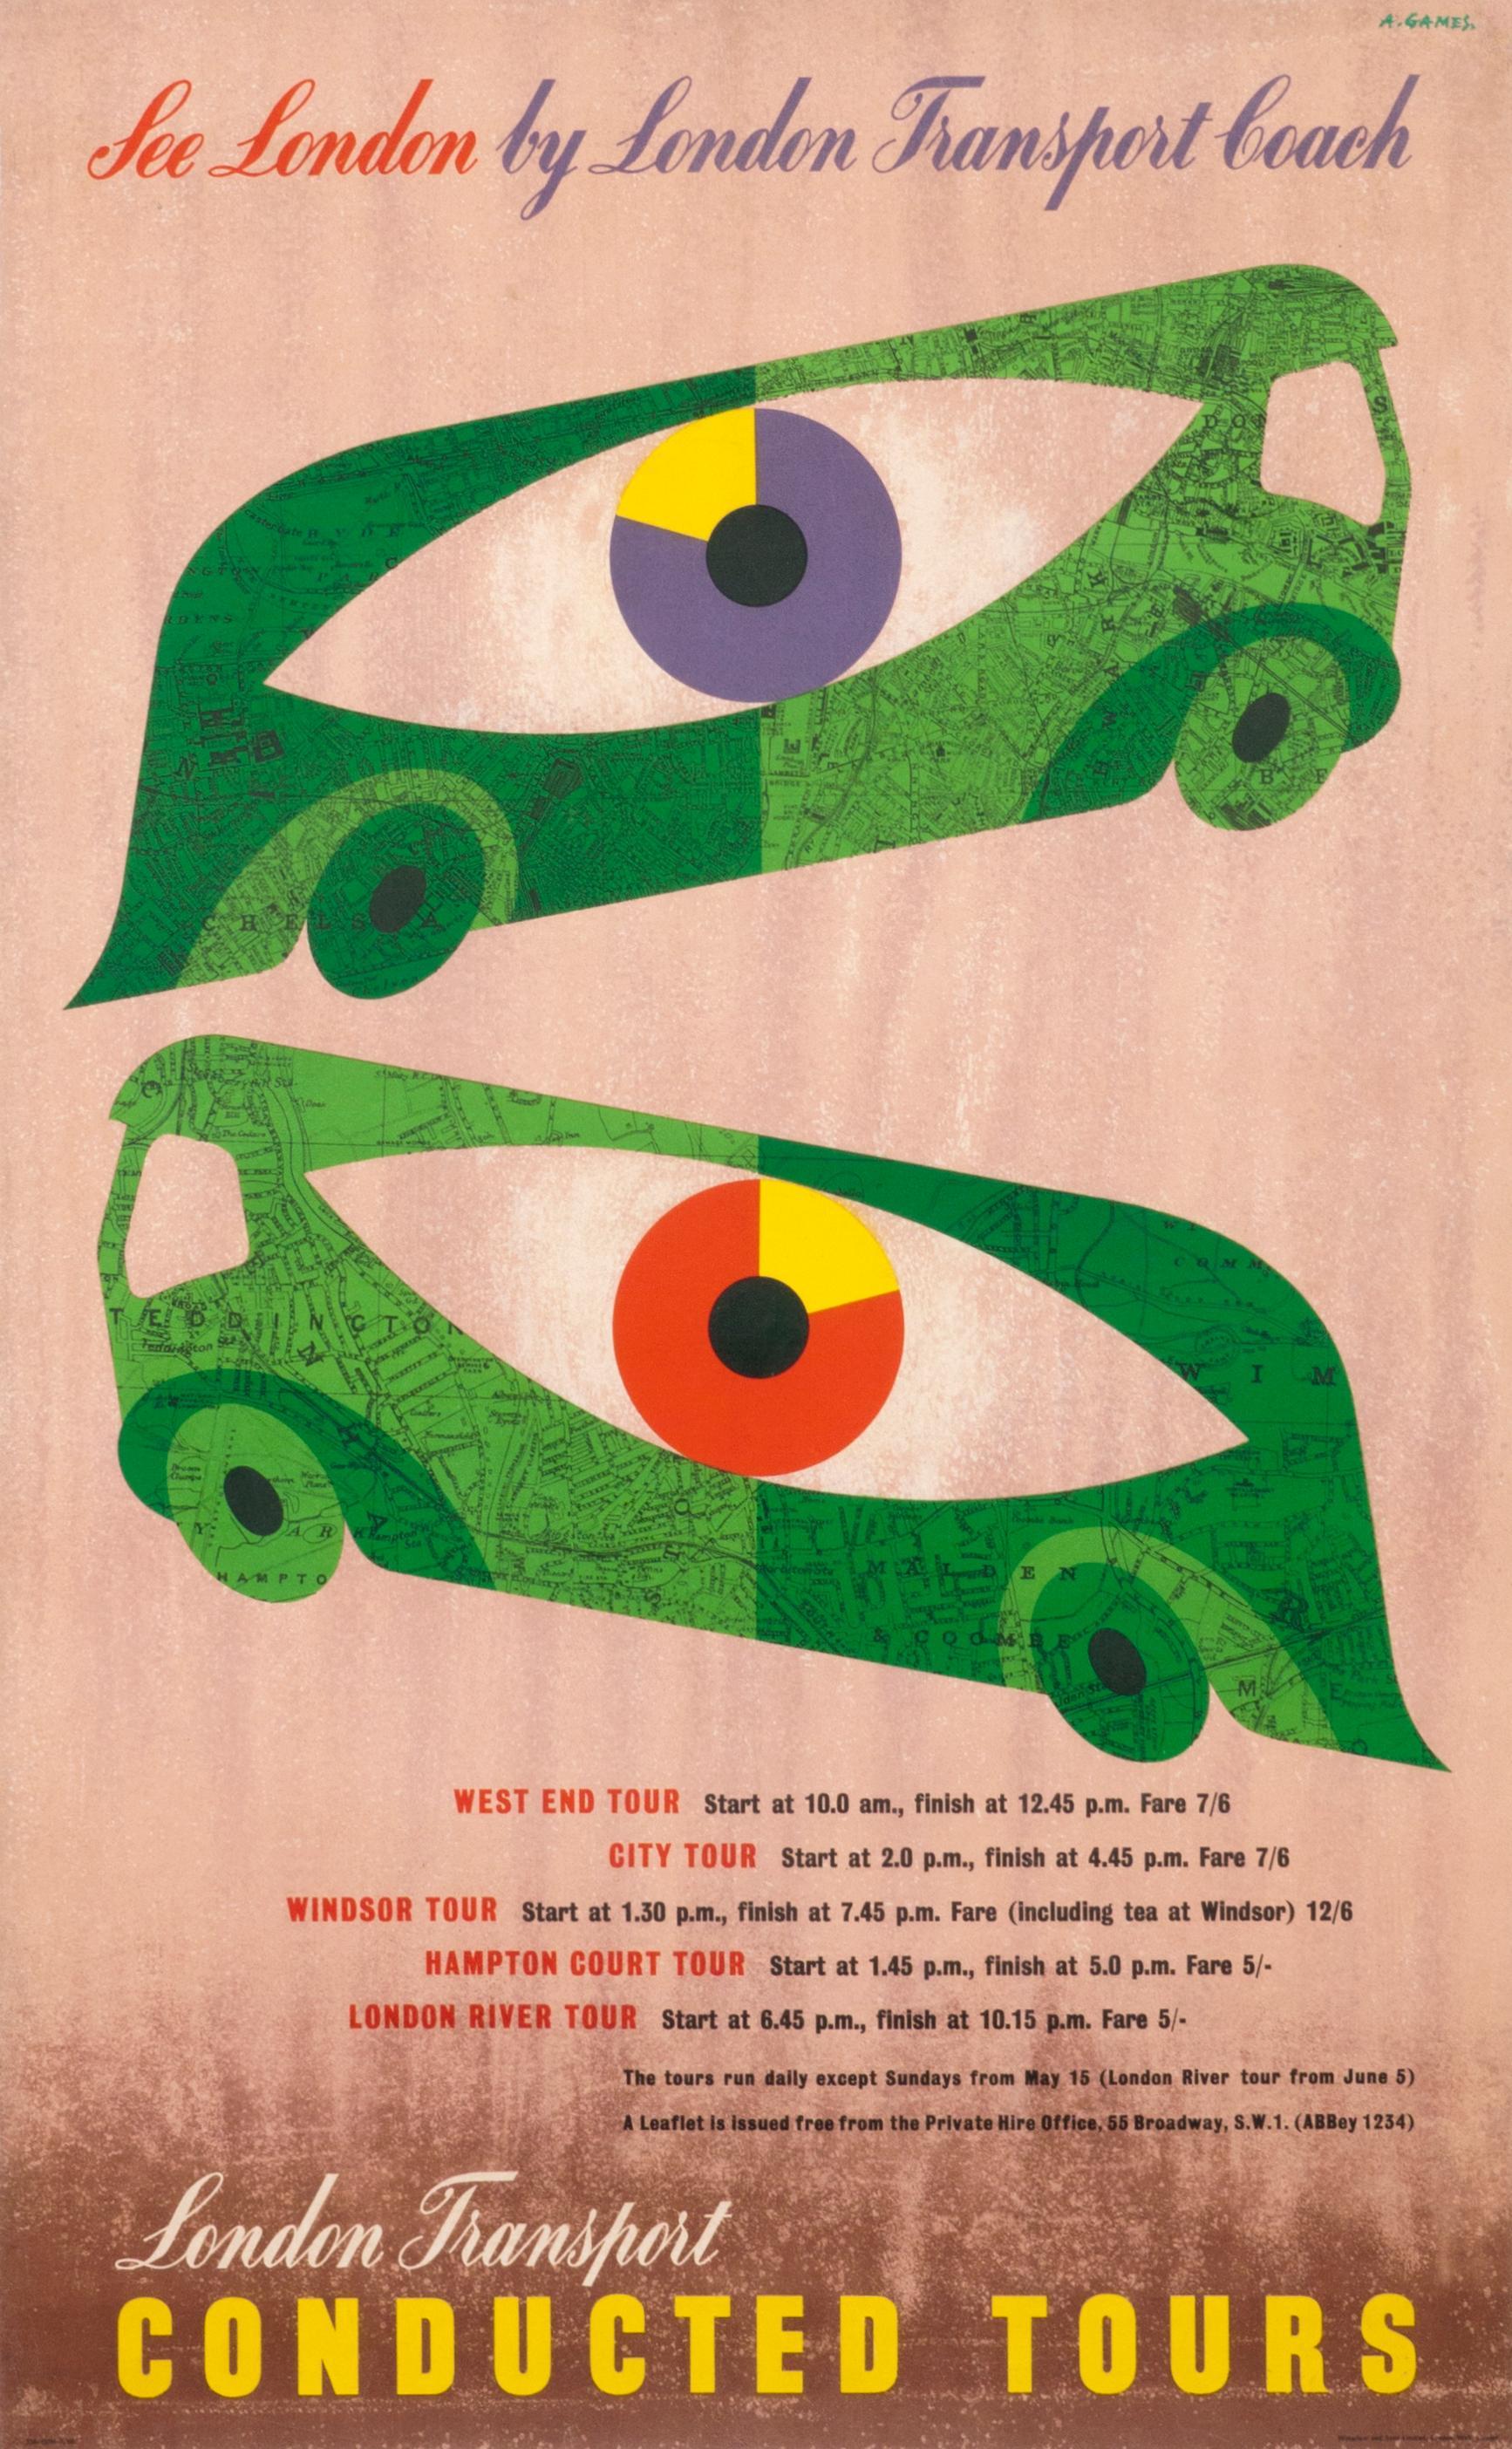 """See London by London Transport Coach"" Original Vintage Tour Poster"